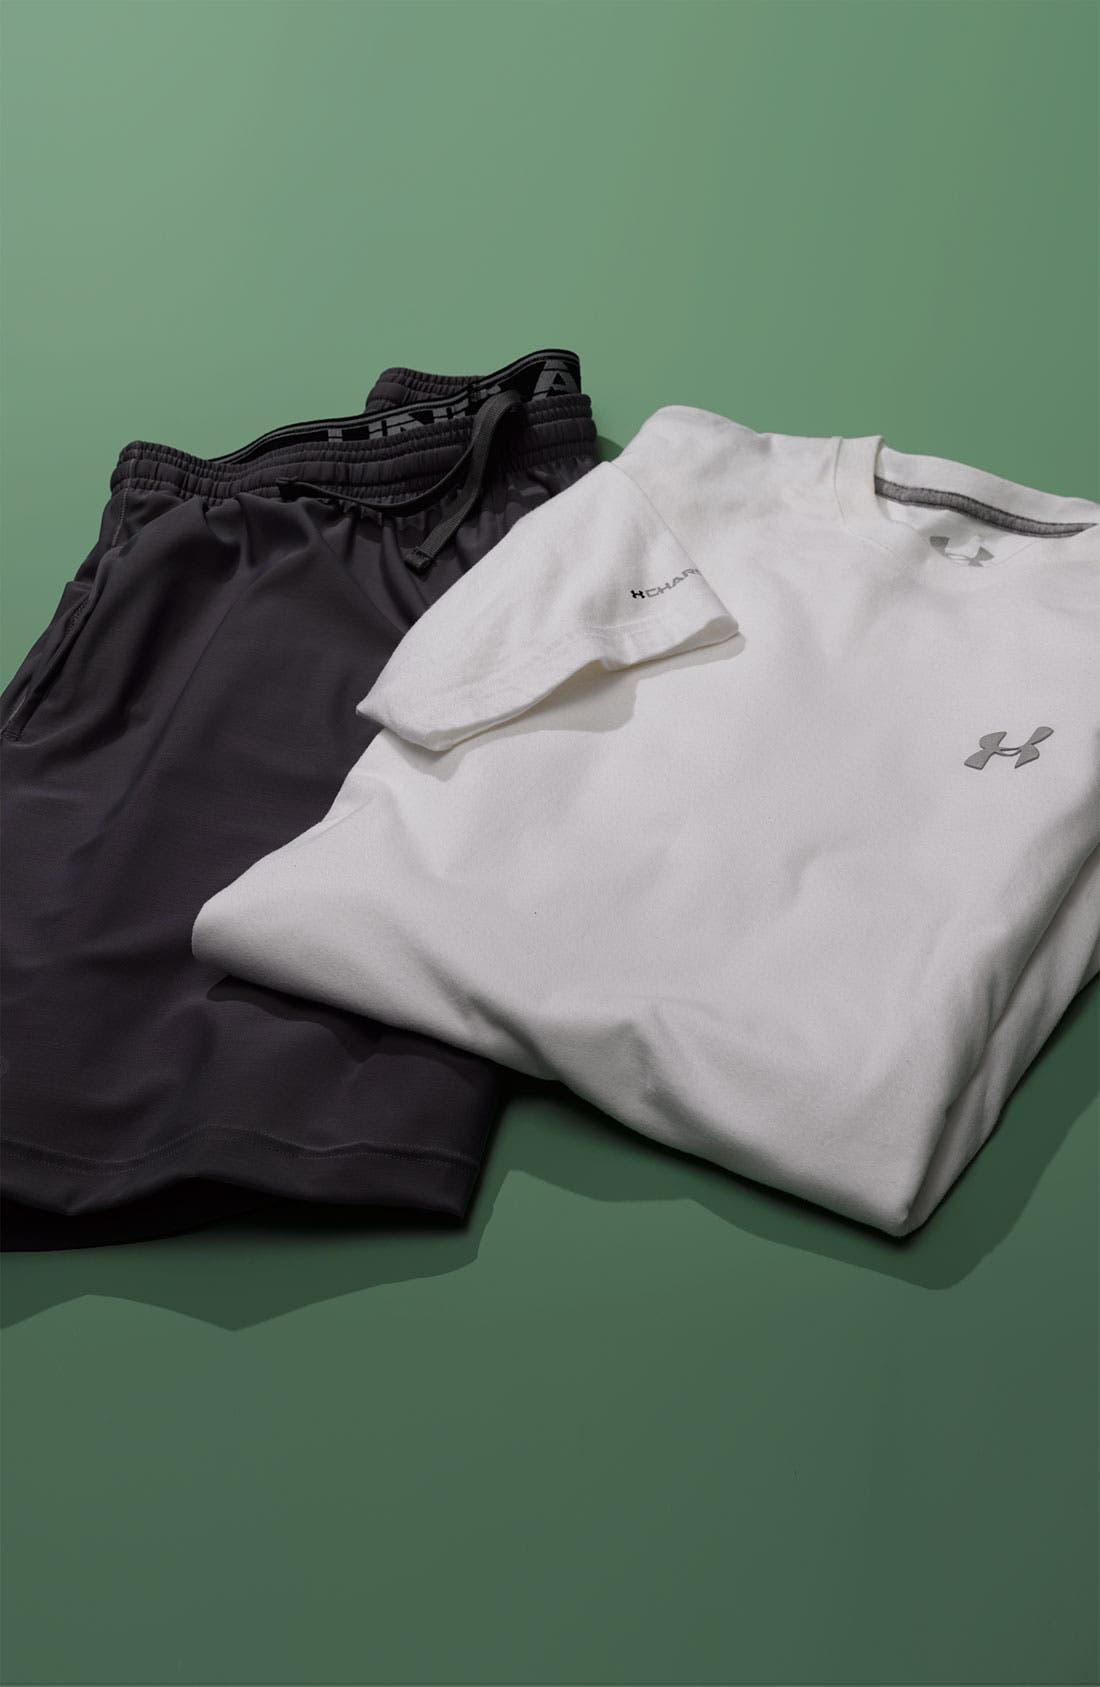 'Micro' HeatGear<sup>®</sup> Knit Shorts,                             Alternate thumbnail 2, color,                             001